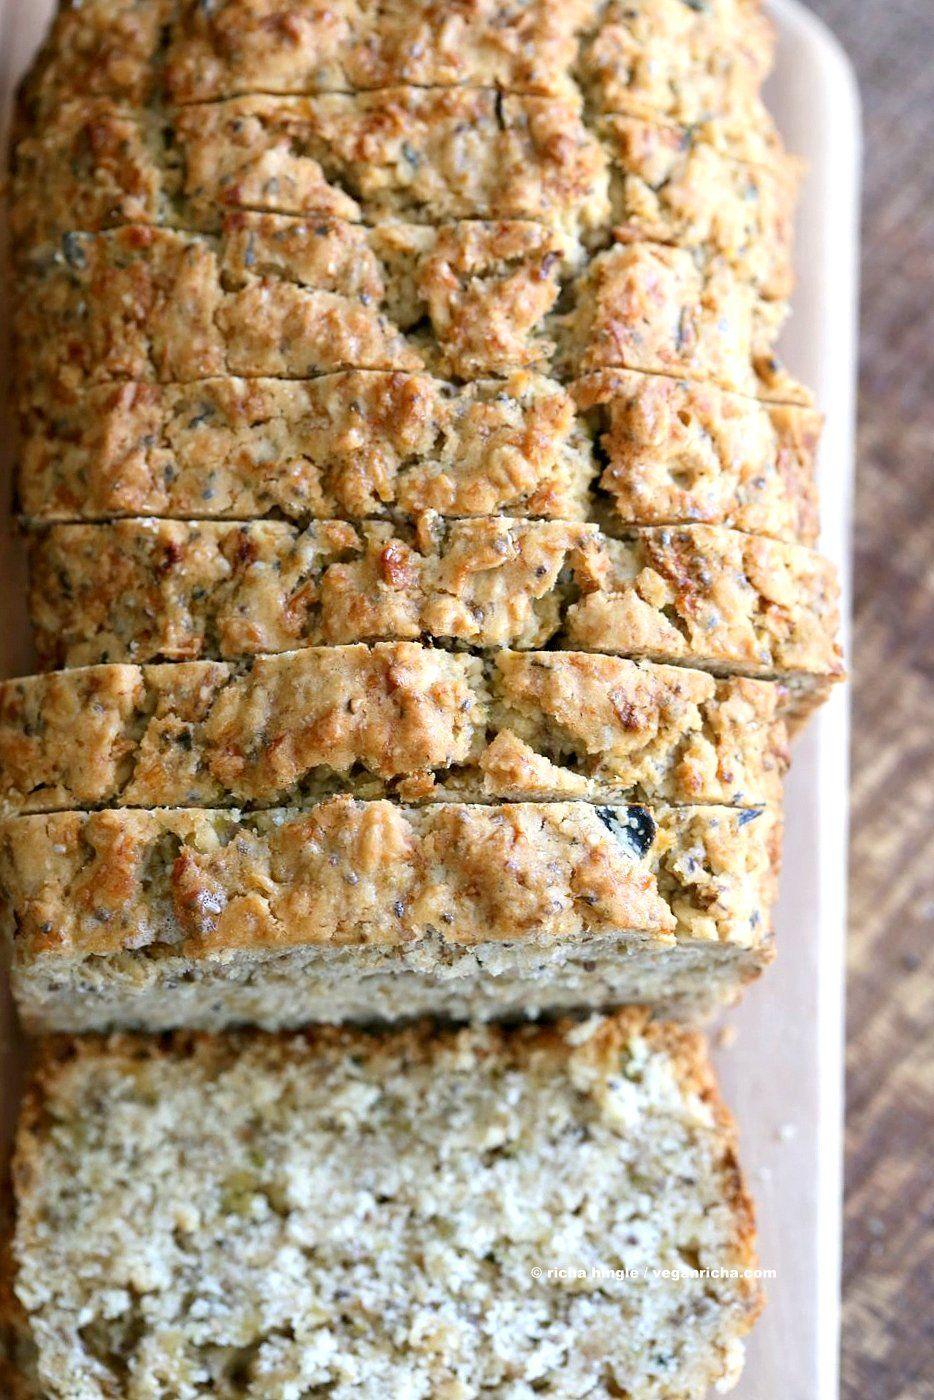 Vegan Gluten Free Zucchini Bread Recipe Vegan Richa Recipe Vegan Gluten Free Vegan Zucchini Zucchini Bread Recipes